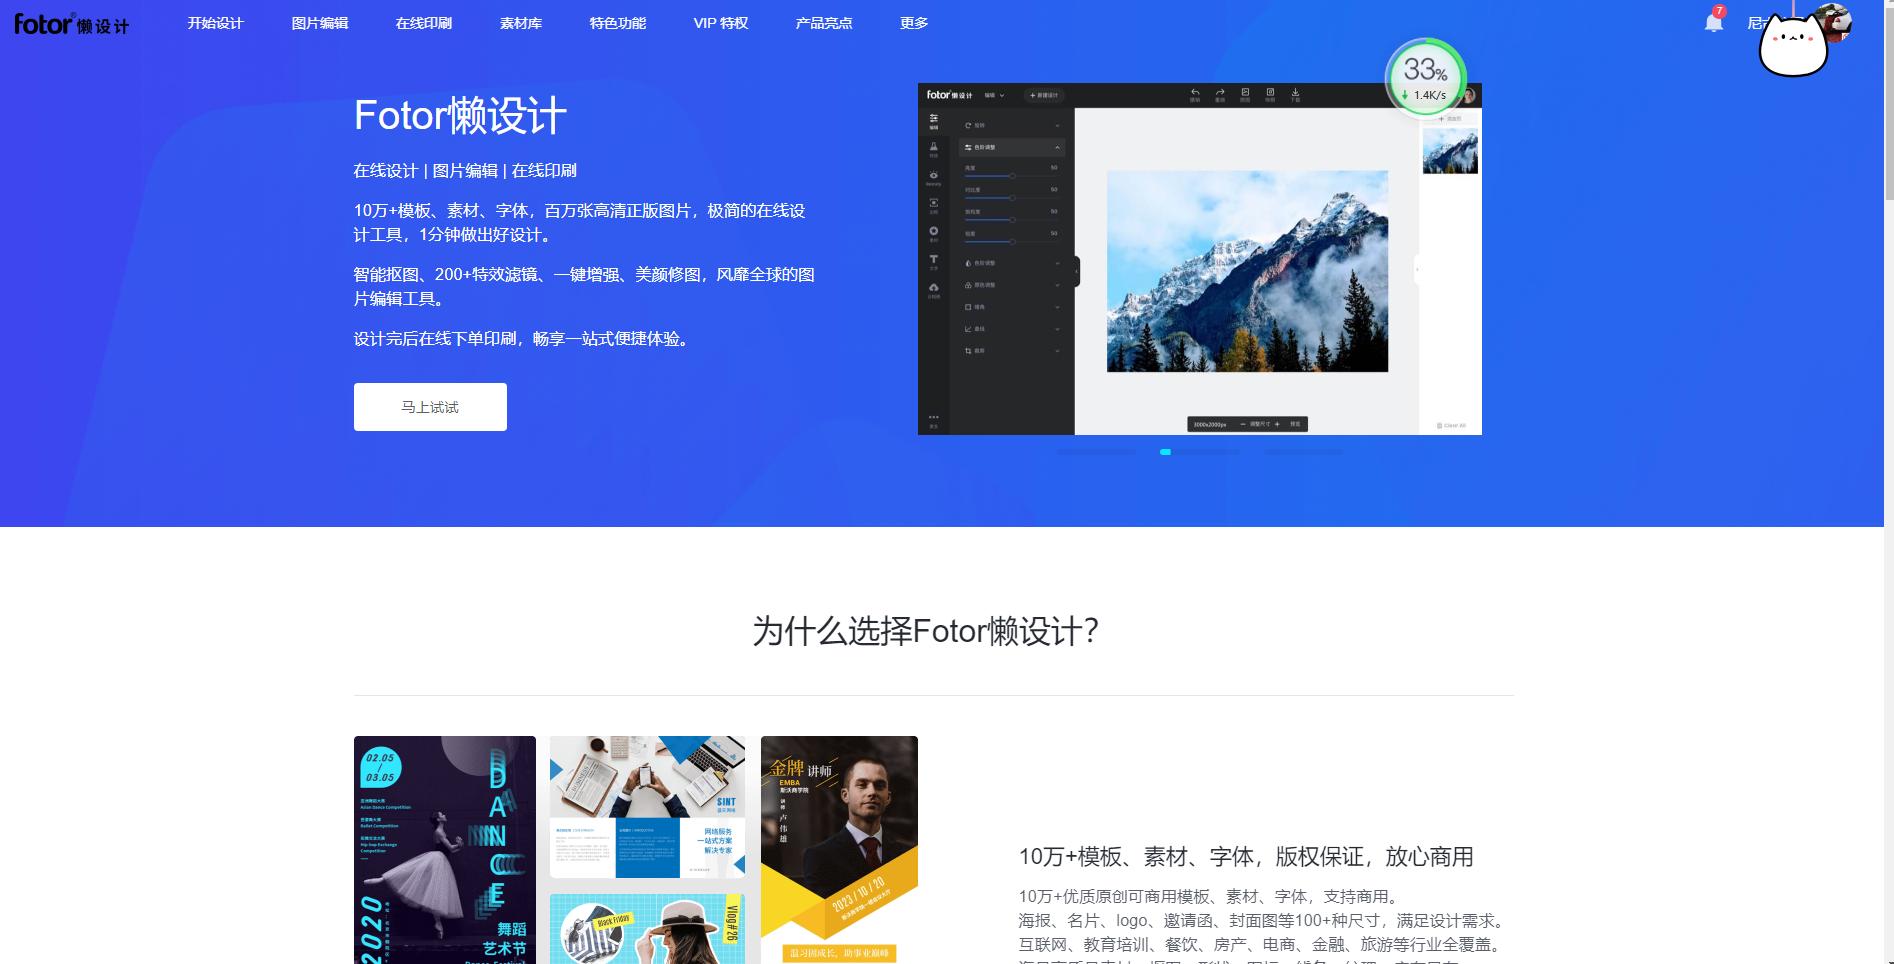 "Fotor曾被BBC誉为""Photoshop的后继者""。Fotor移动端(iOS & Android)是Facebook Messenger在全球首批合作的中国区开发者,并曾获得Google Play颁发的""顶尖开发者""荣誉、""Android Excellence Apps""奖项"